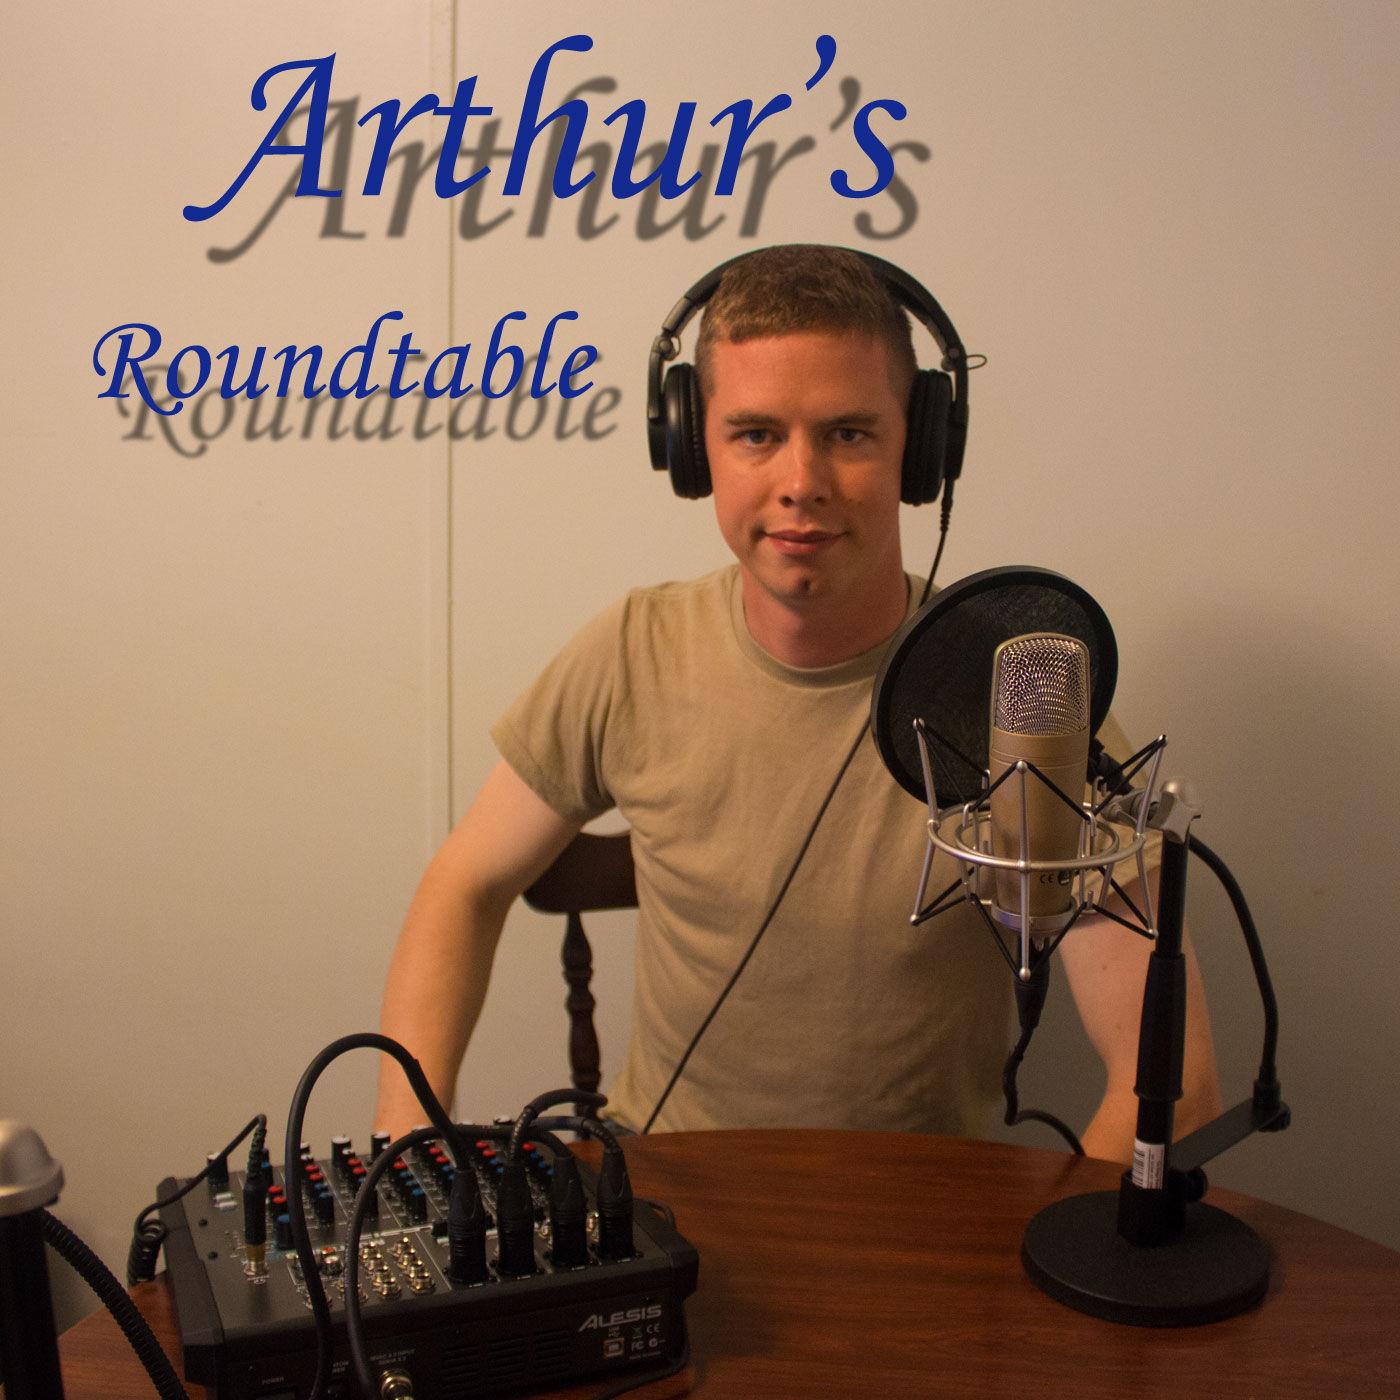 Arthur's Roundtable